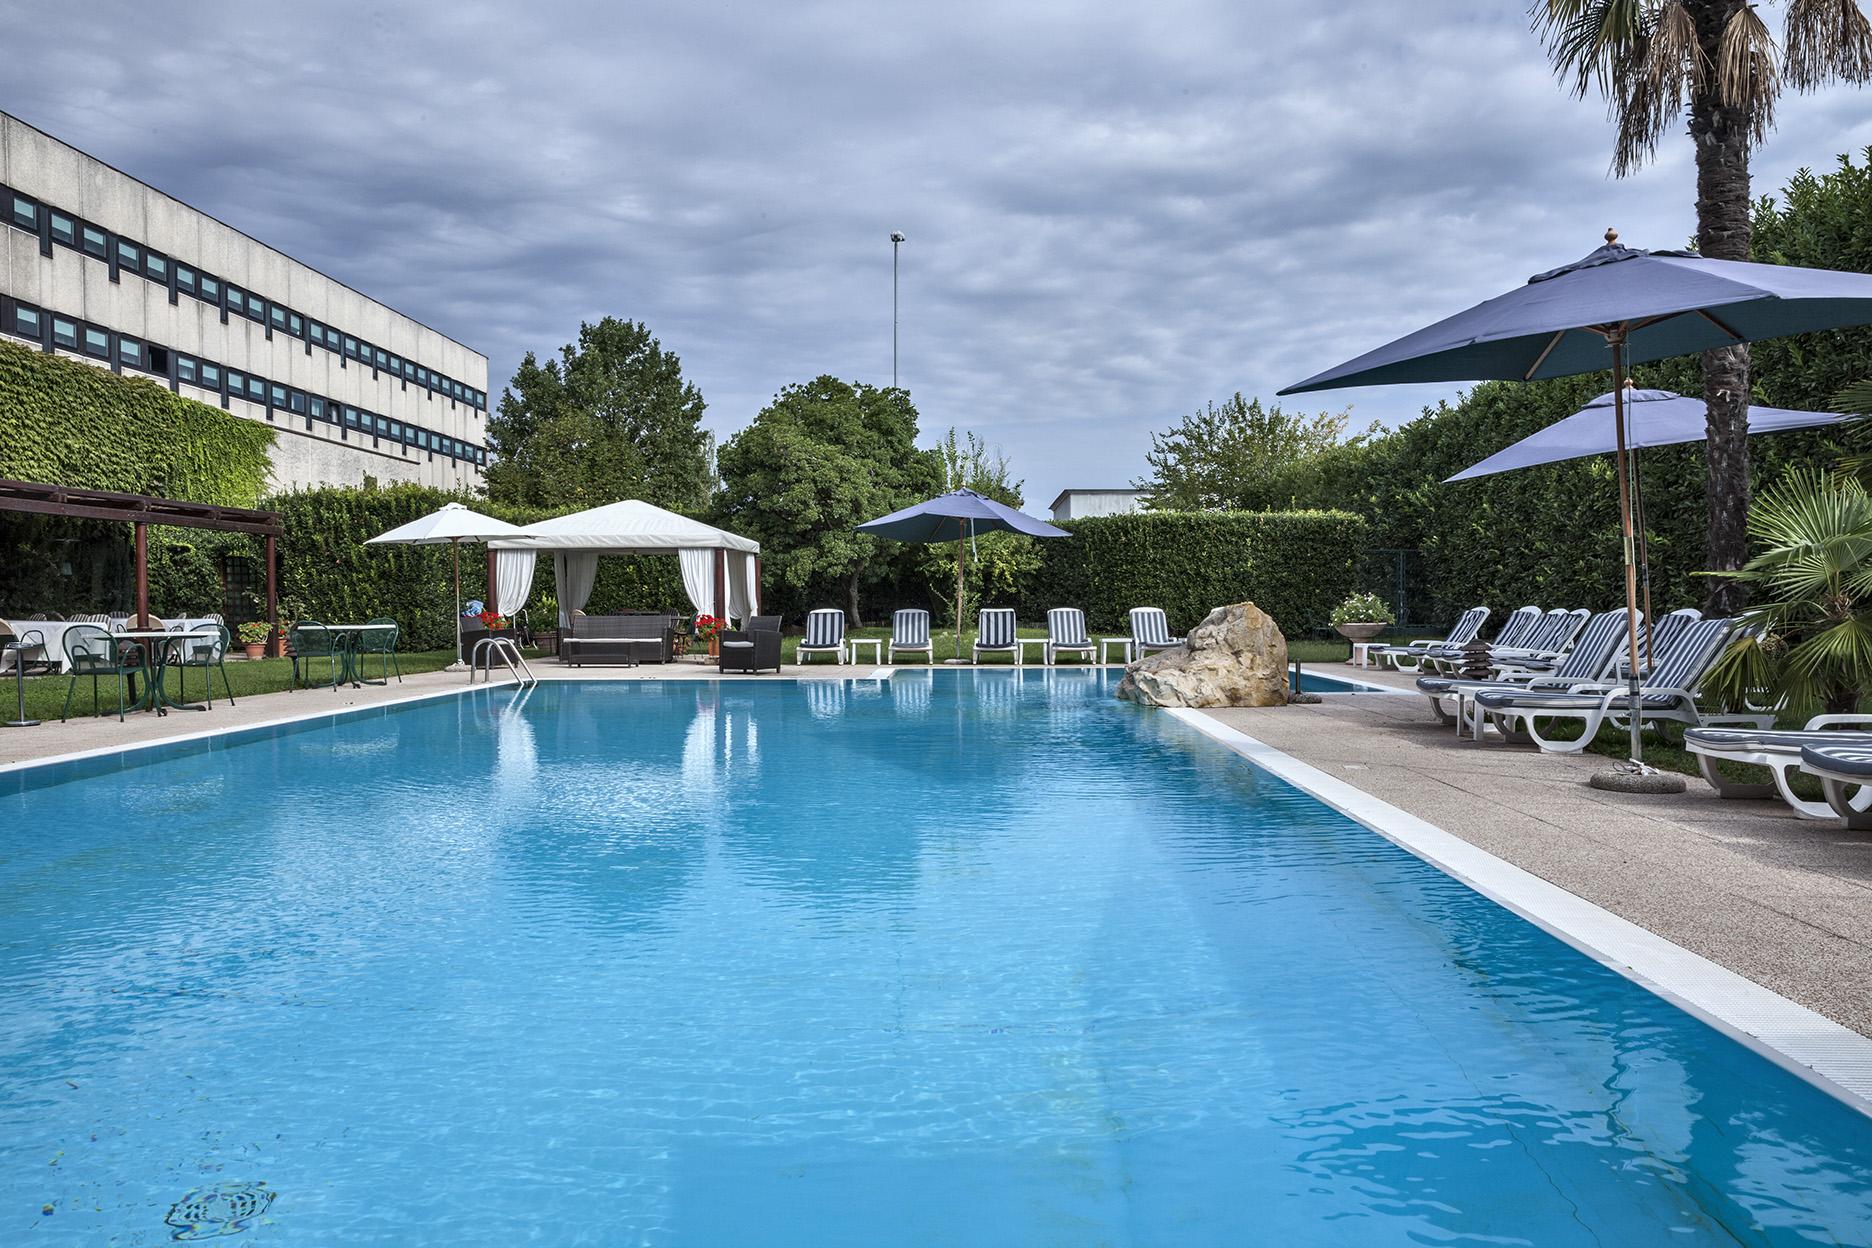 Hotel Saccardi piscina_nuvoloso_ms100-70